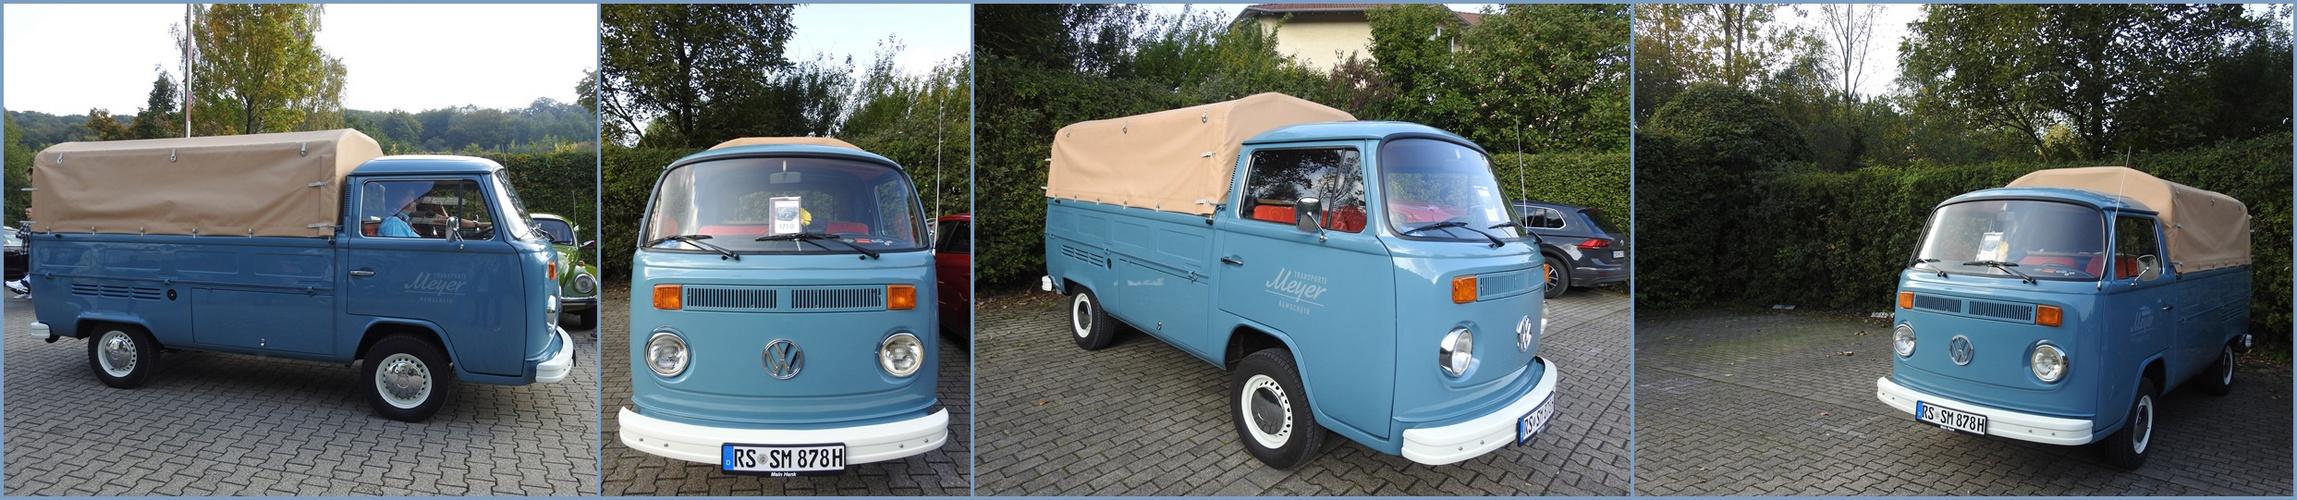 alter vw bulli foto bild oldtimer auto deutschland. Black Bedroom Furniture Sets. Home Design Ideas